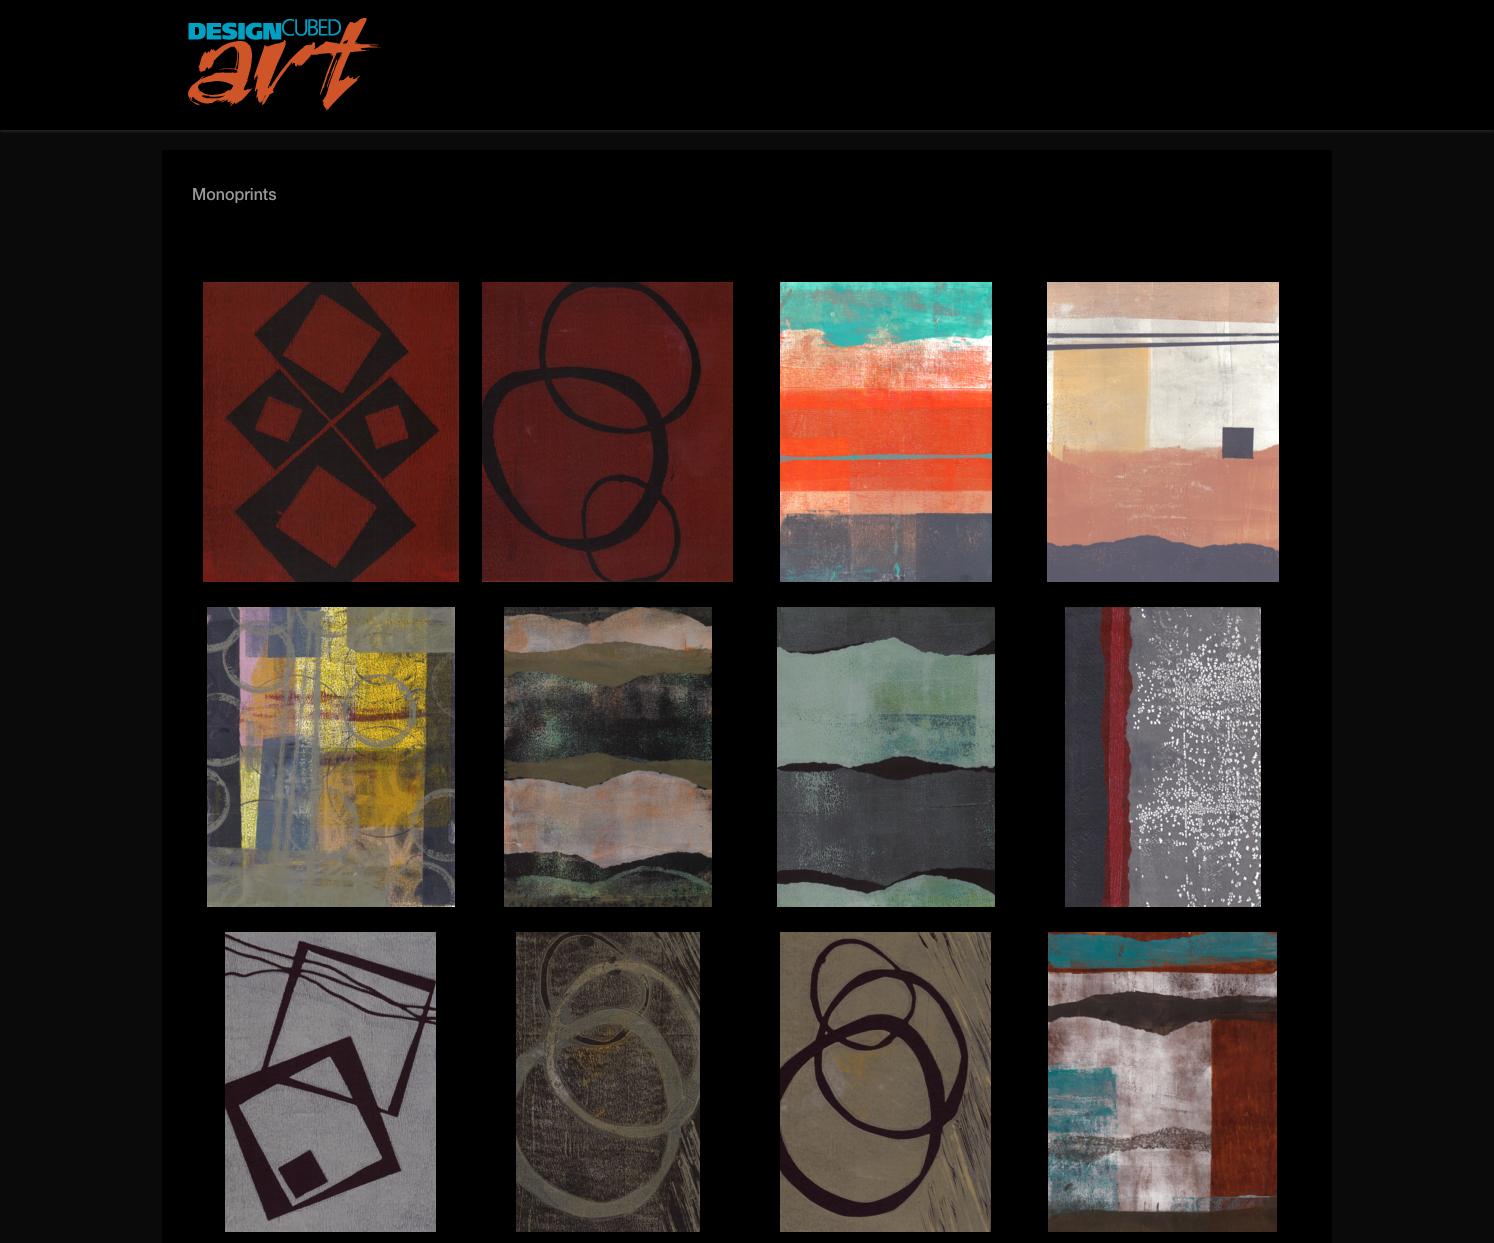 Design Cubed Art Home Page Image